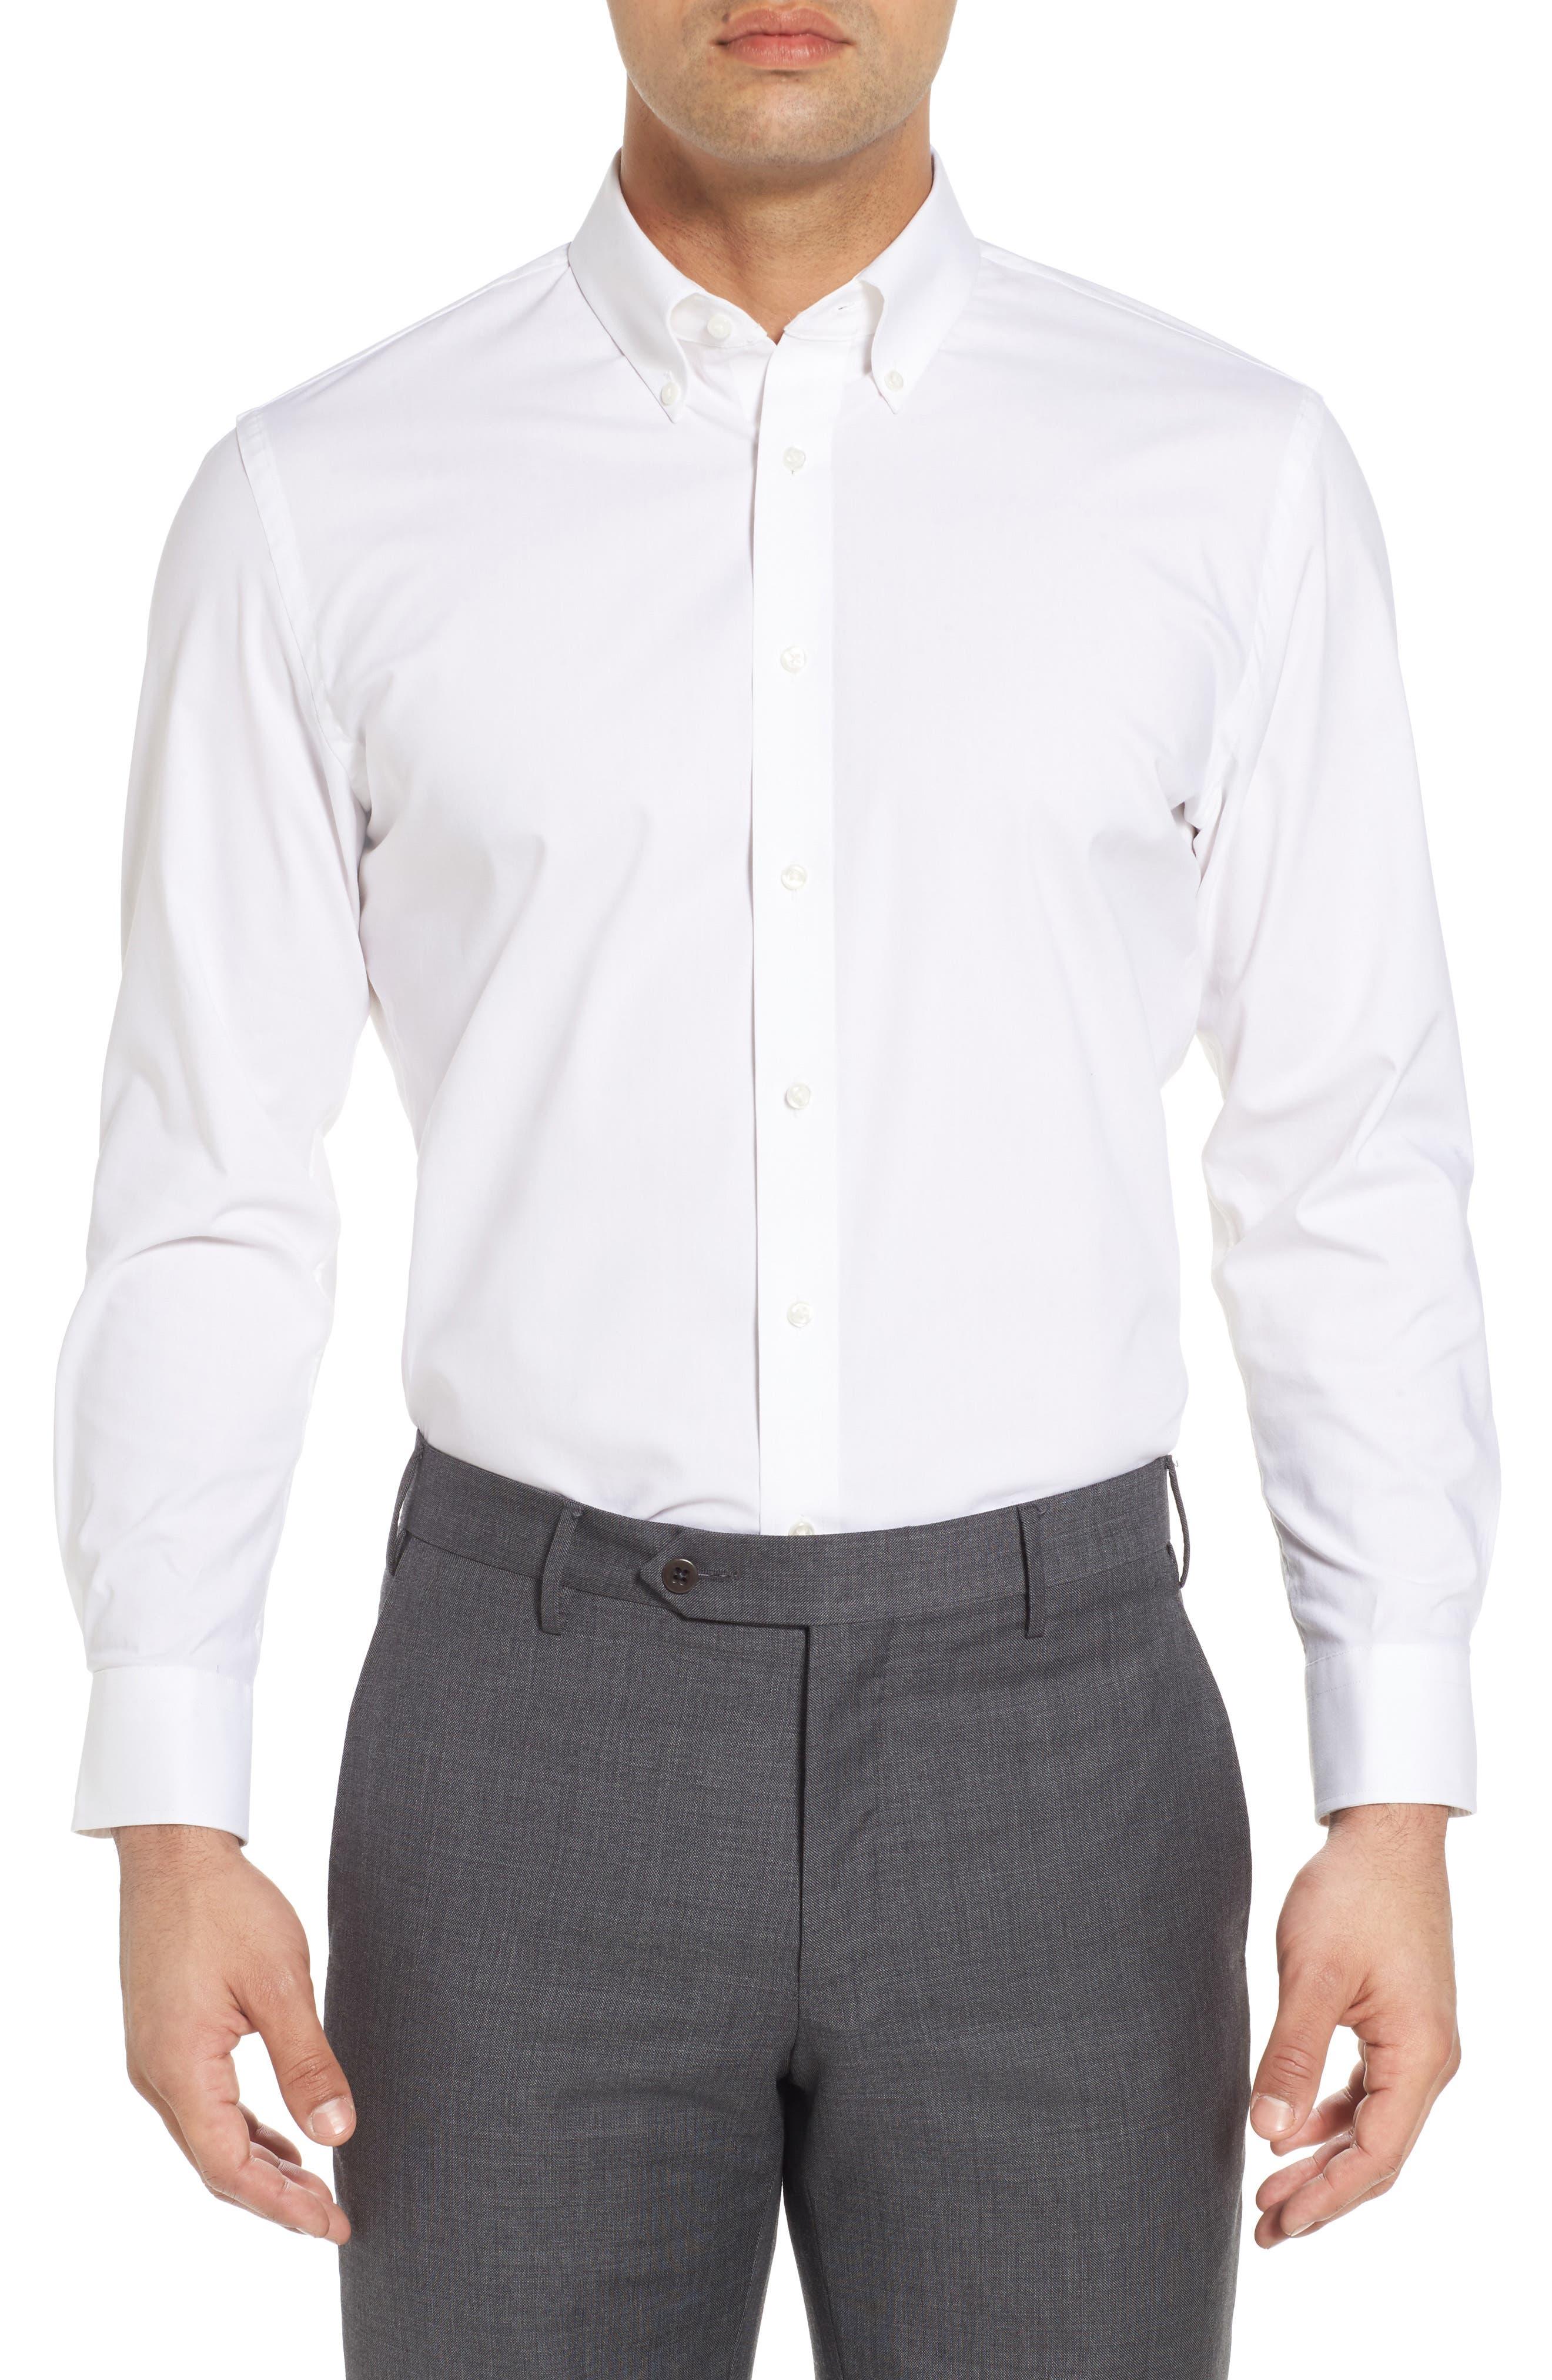 Tech-Smart Trim Fit Stretch Pinpoint Dress Shirt,                         Main,                         color, WHITE